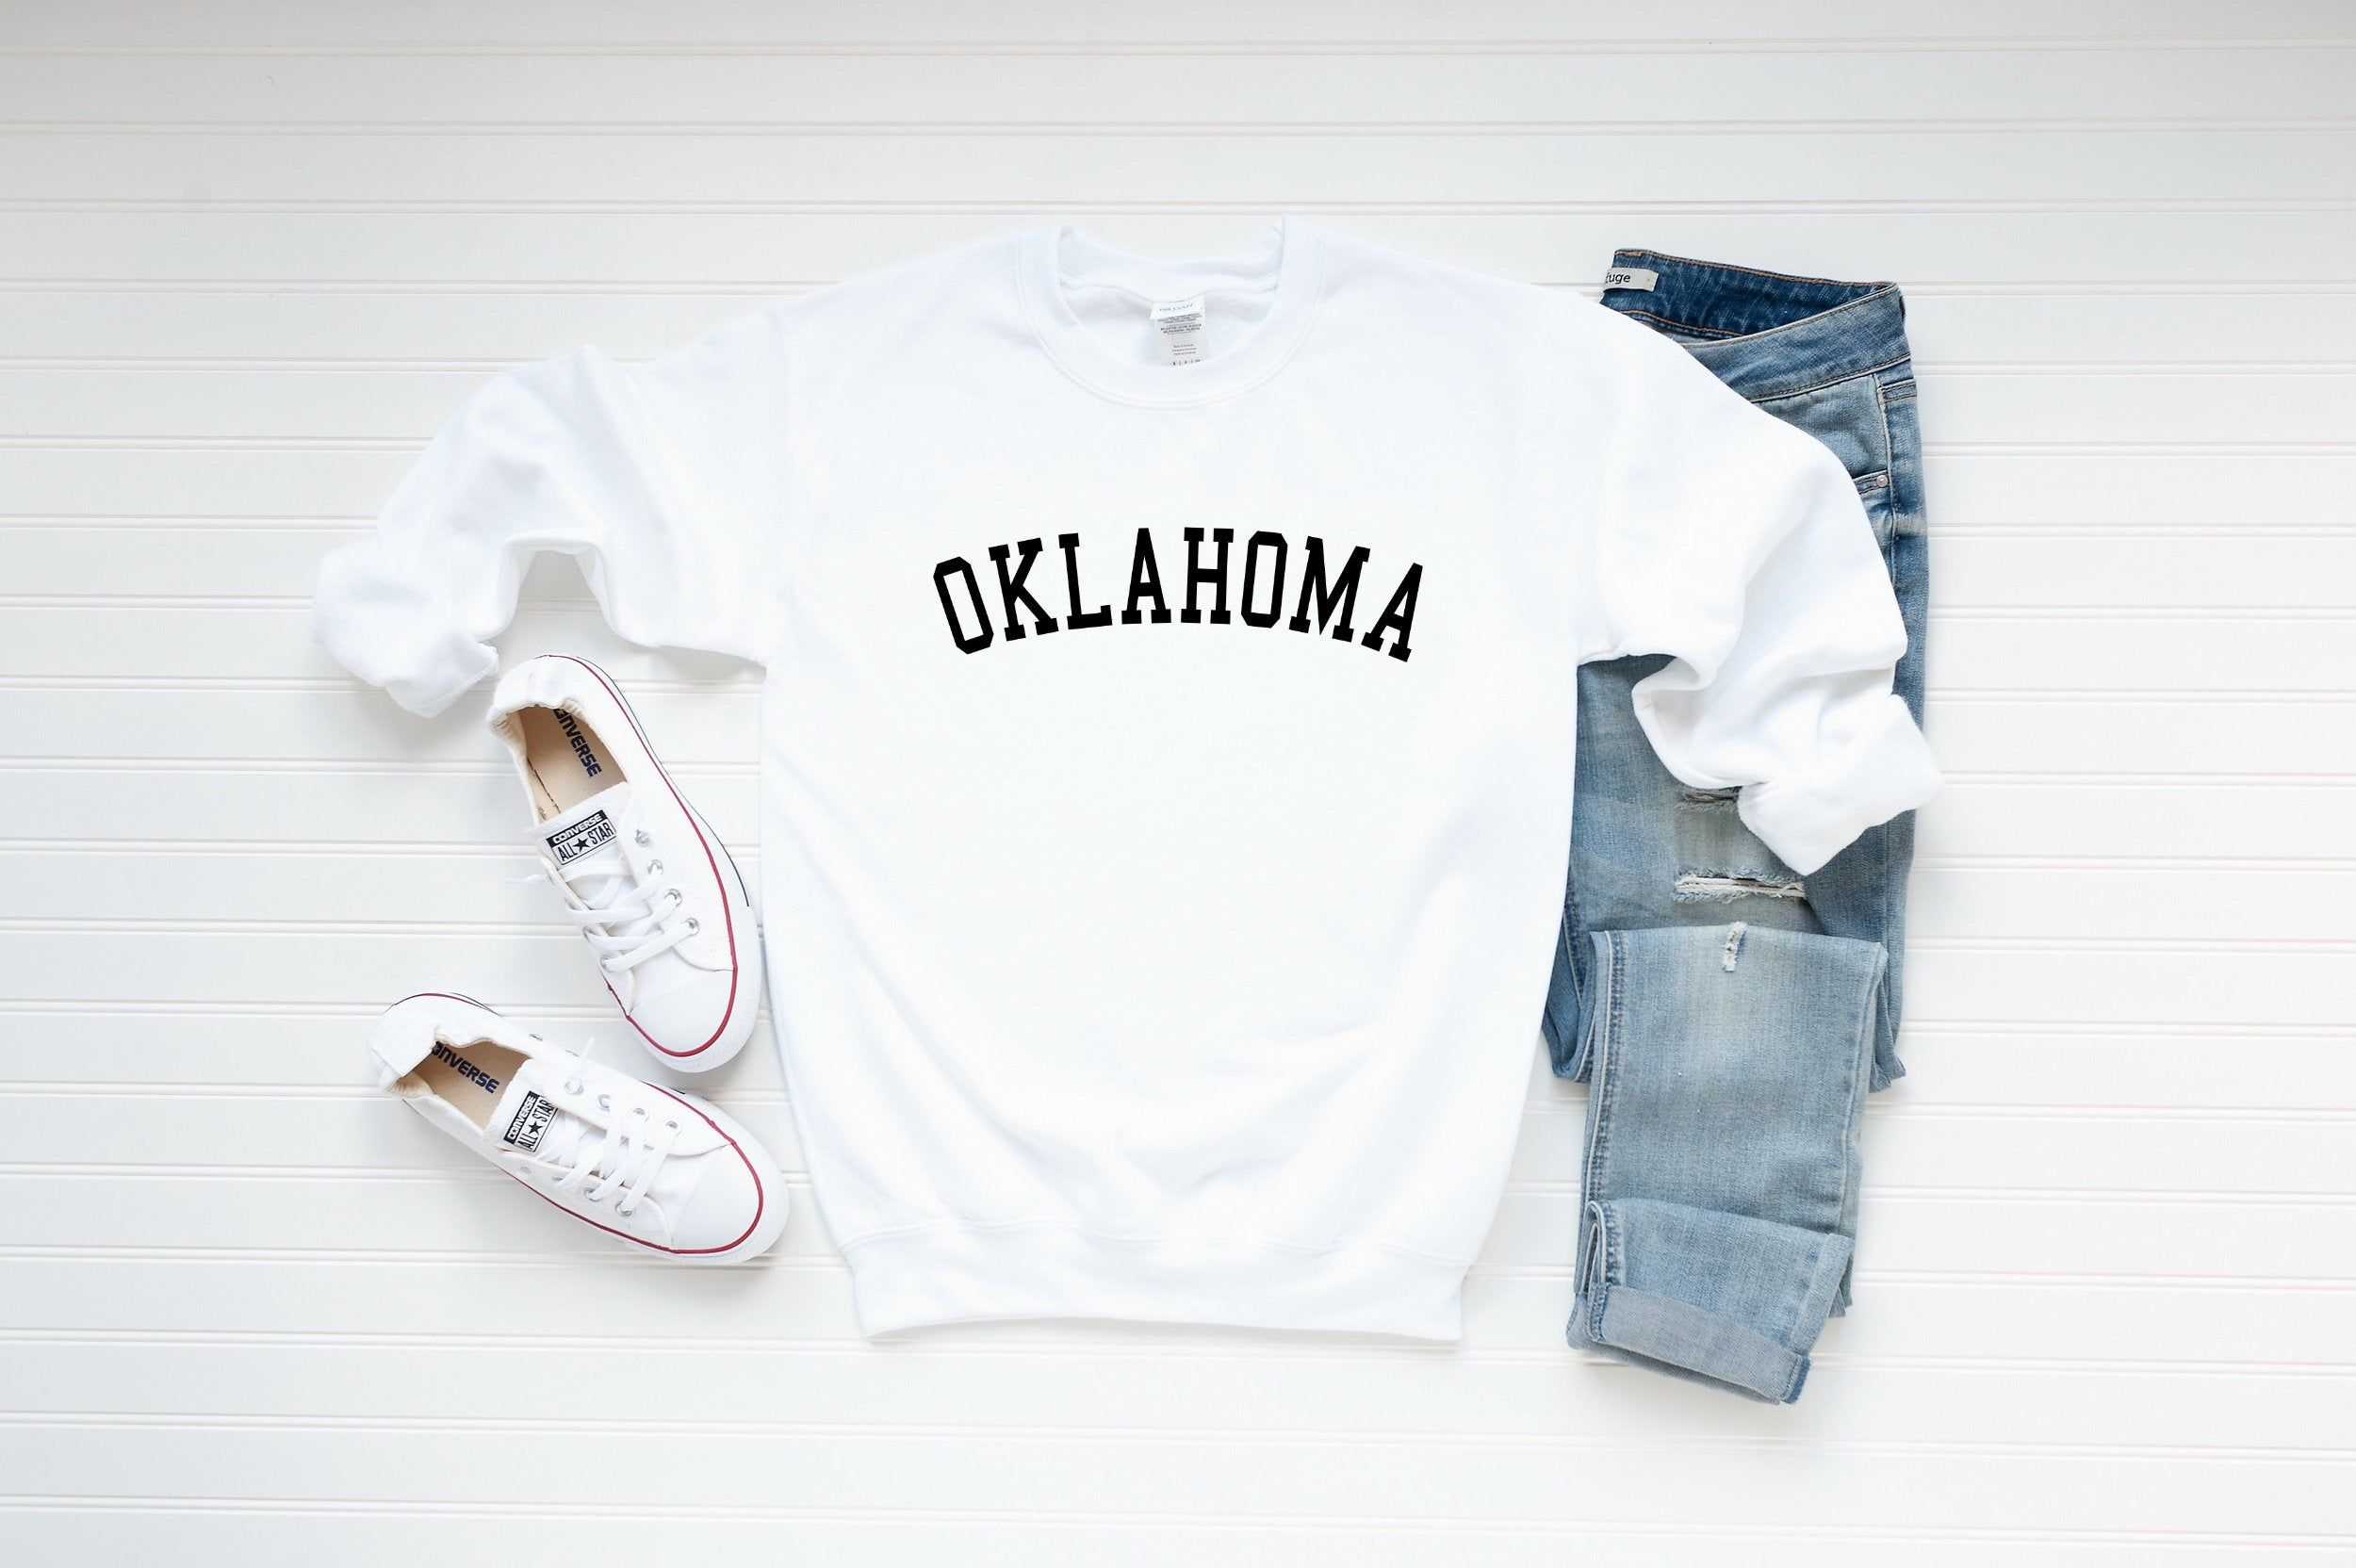 Oklahoma Sweatshirt Oklahoma Crewneck Sweatshirt Oklahoma Etsy In 2020 Vintage Crewneck Sweatshirt Classy Sweatshirt Vintage Crewneck [ 1664 x 2500 Pixel ]